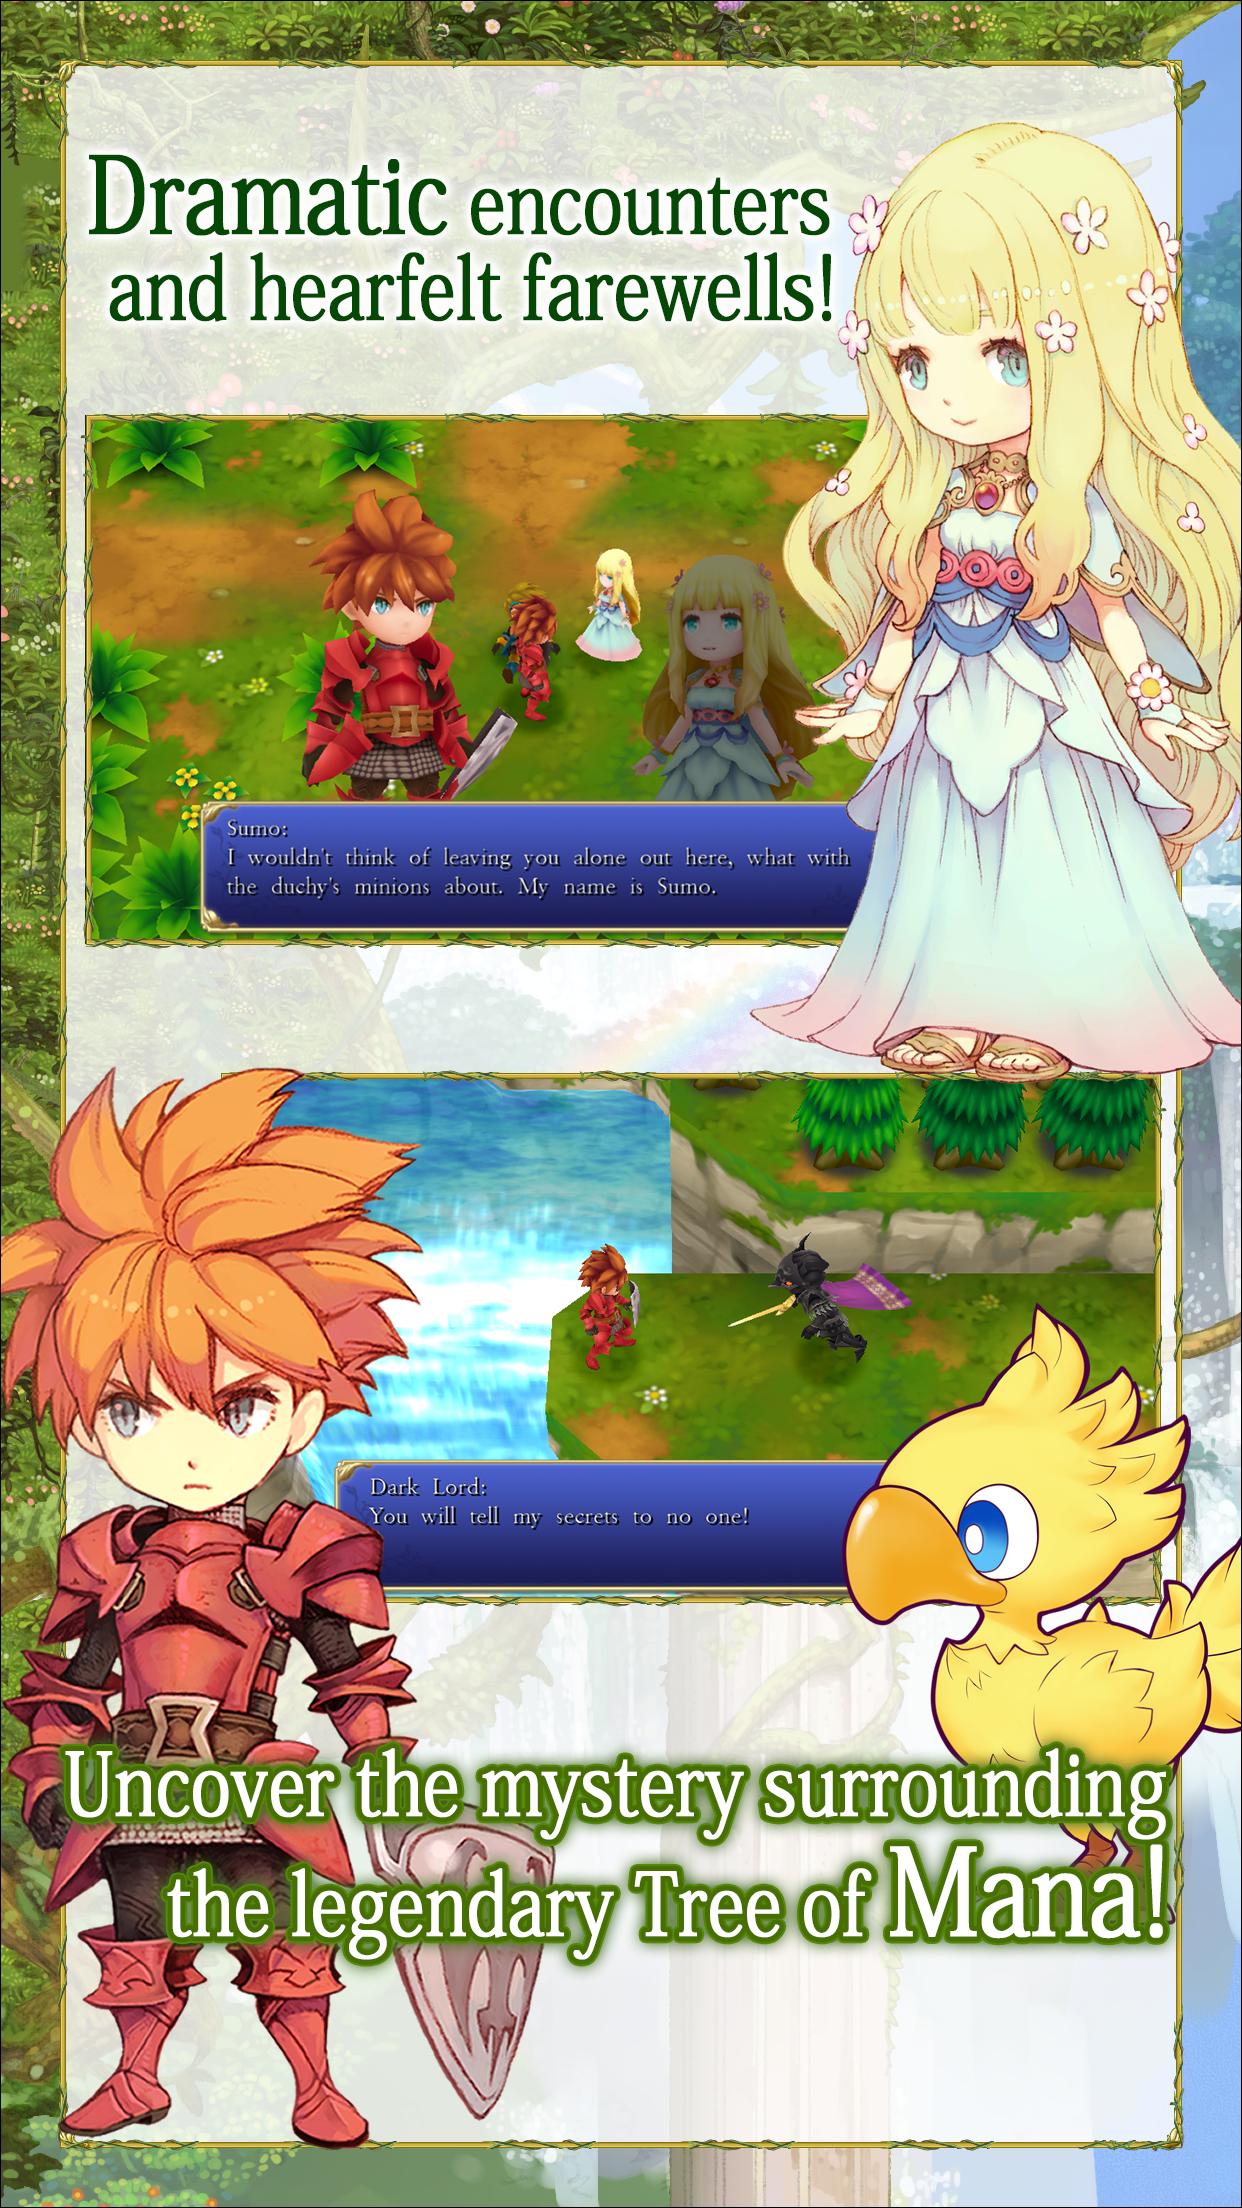 Adventures of Mana screenshot #12